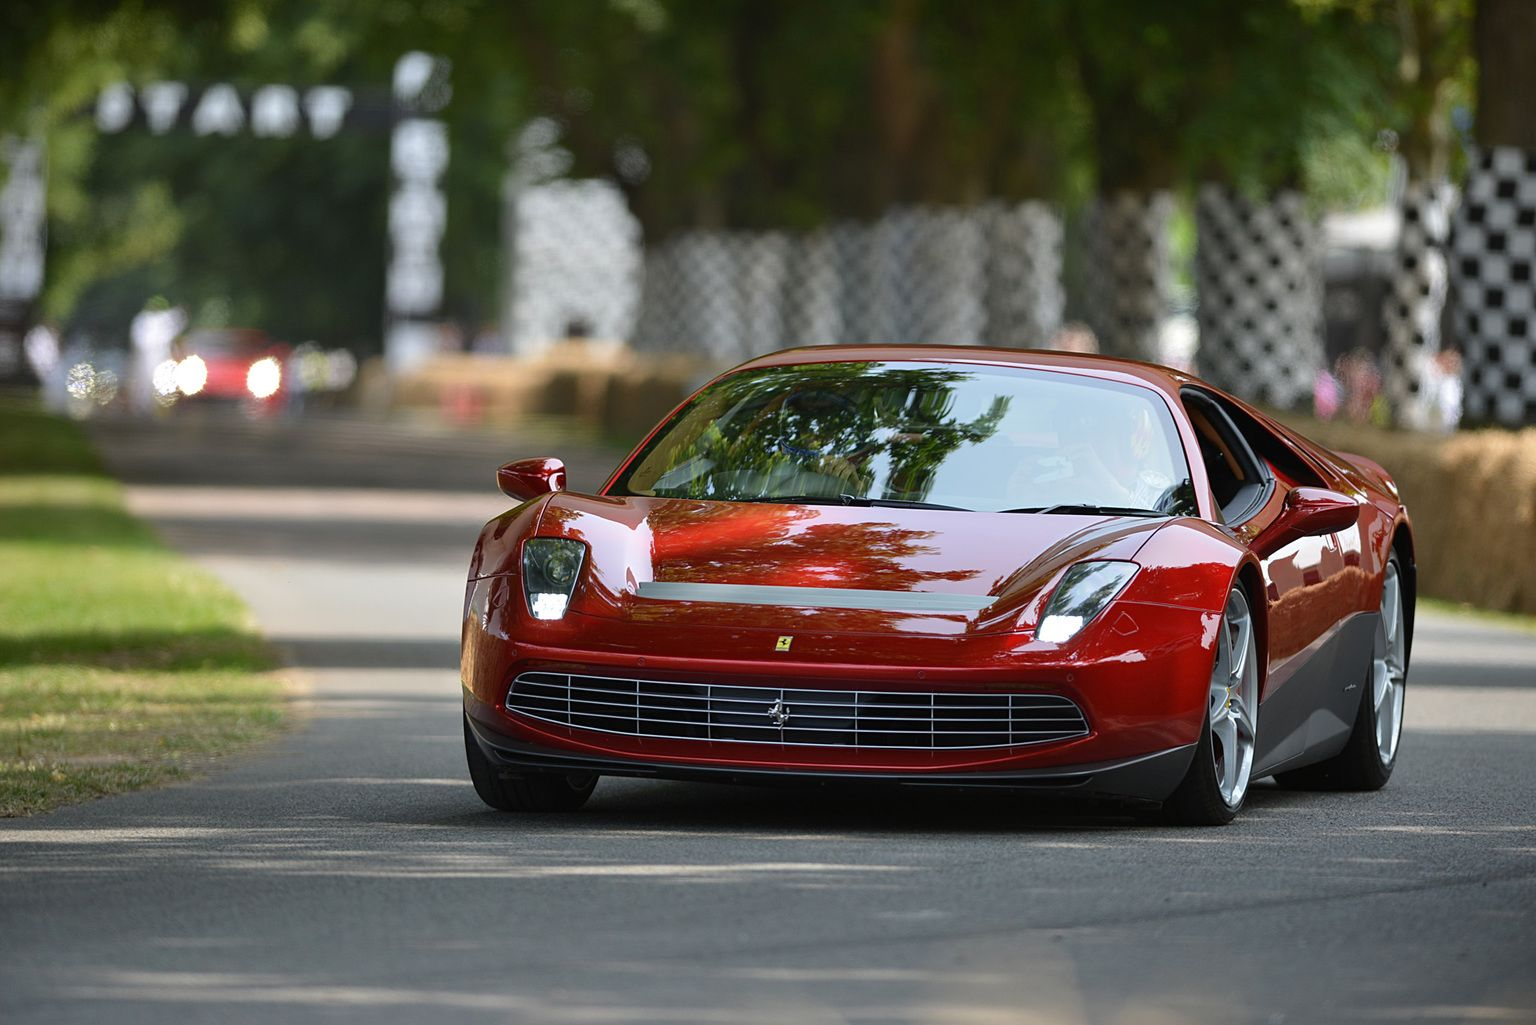 Gallery Home Ferrari Super Cars Goodwood Festival Of Speed